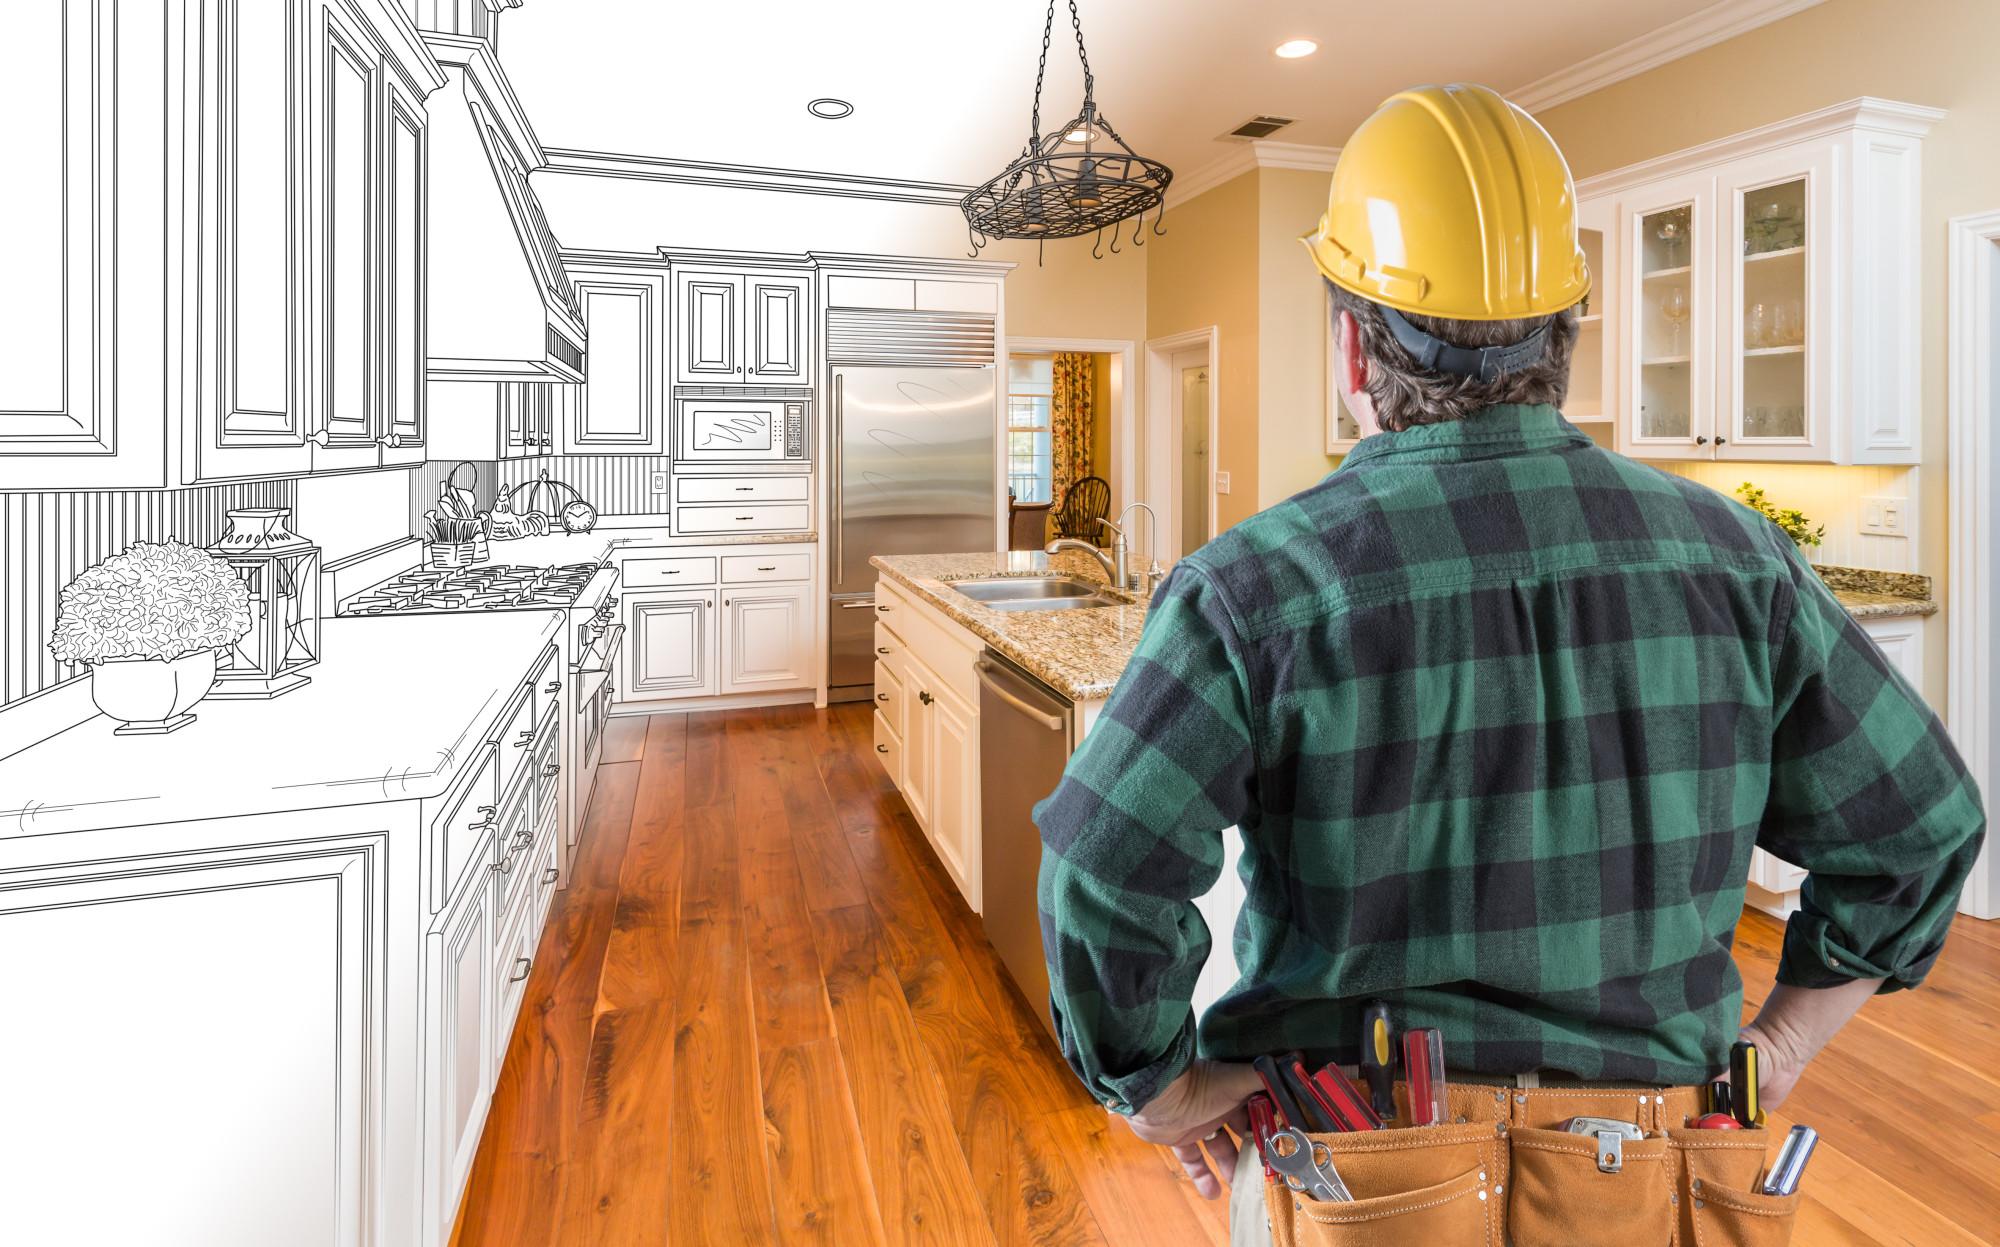 Professional Kitchen Remodeler at Work